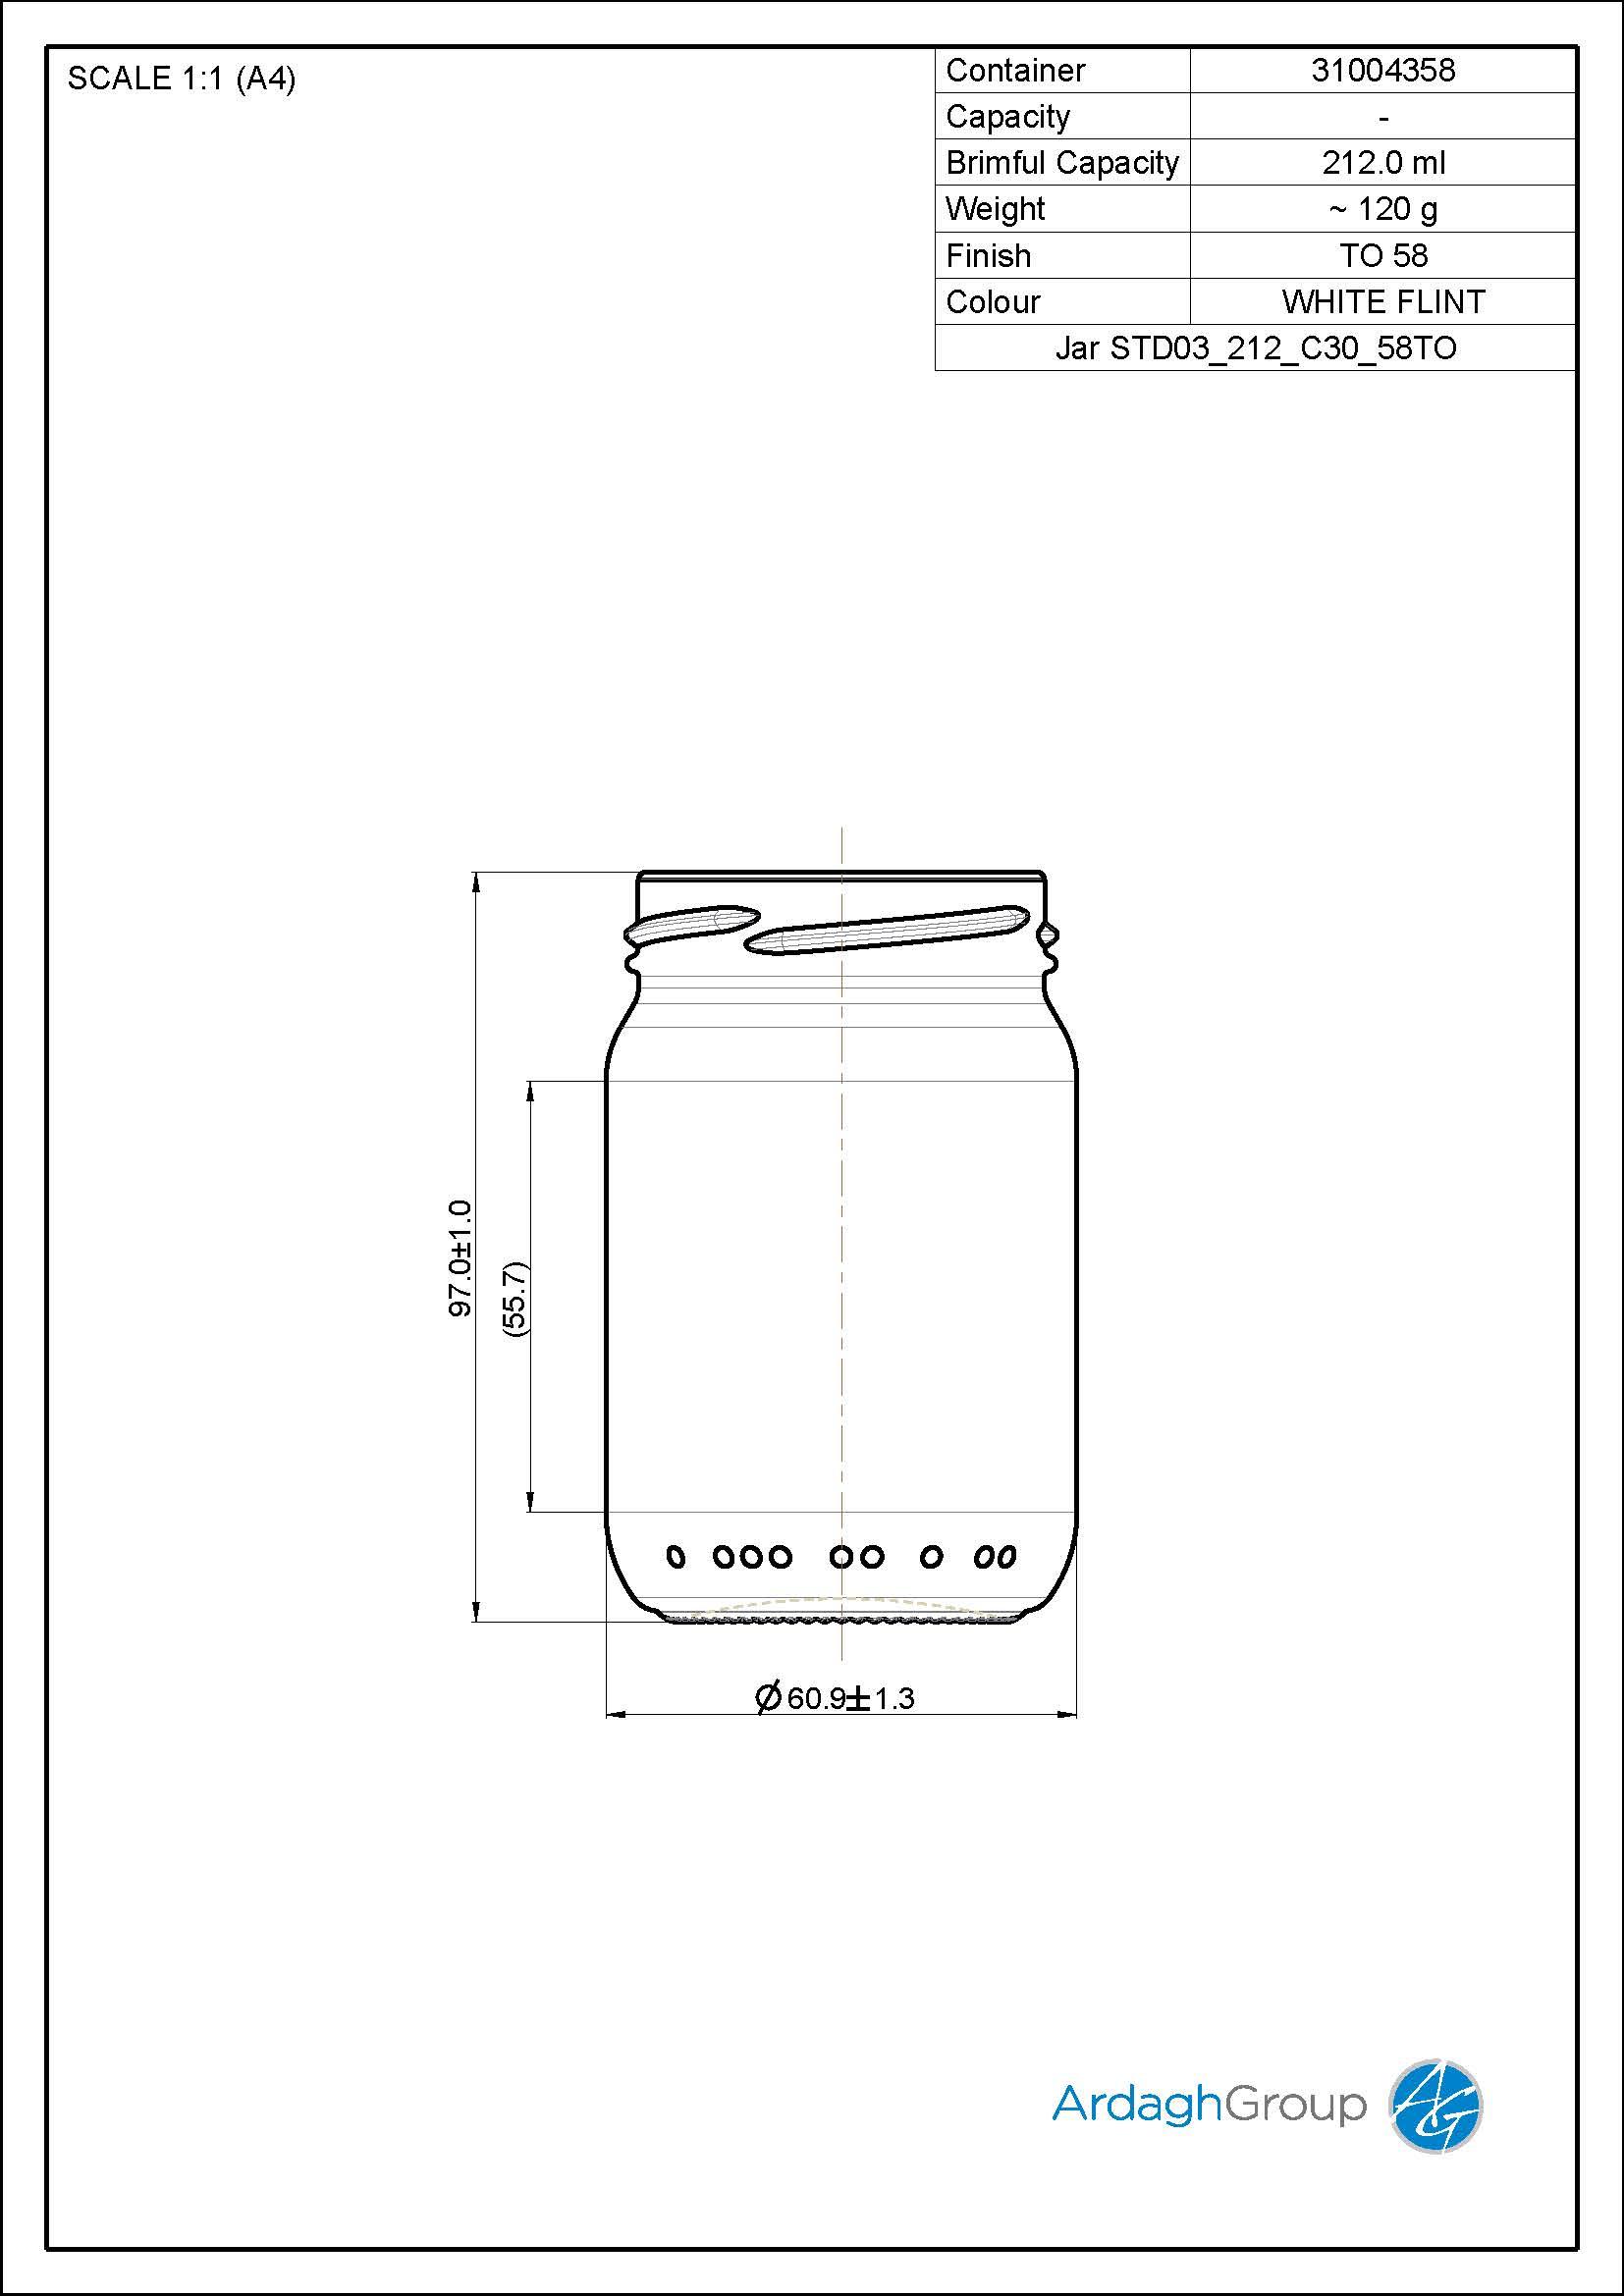 Jar STD03 212 C30 58TO